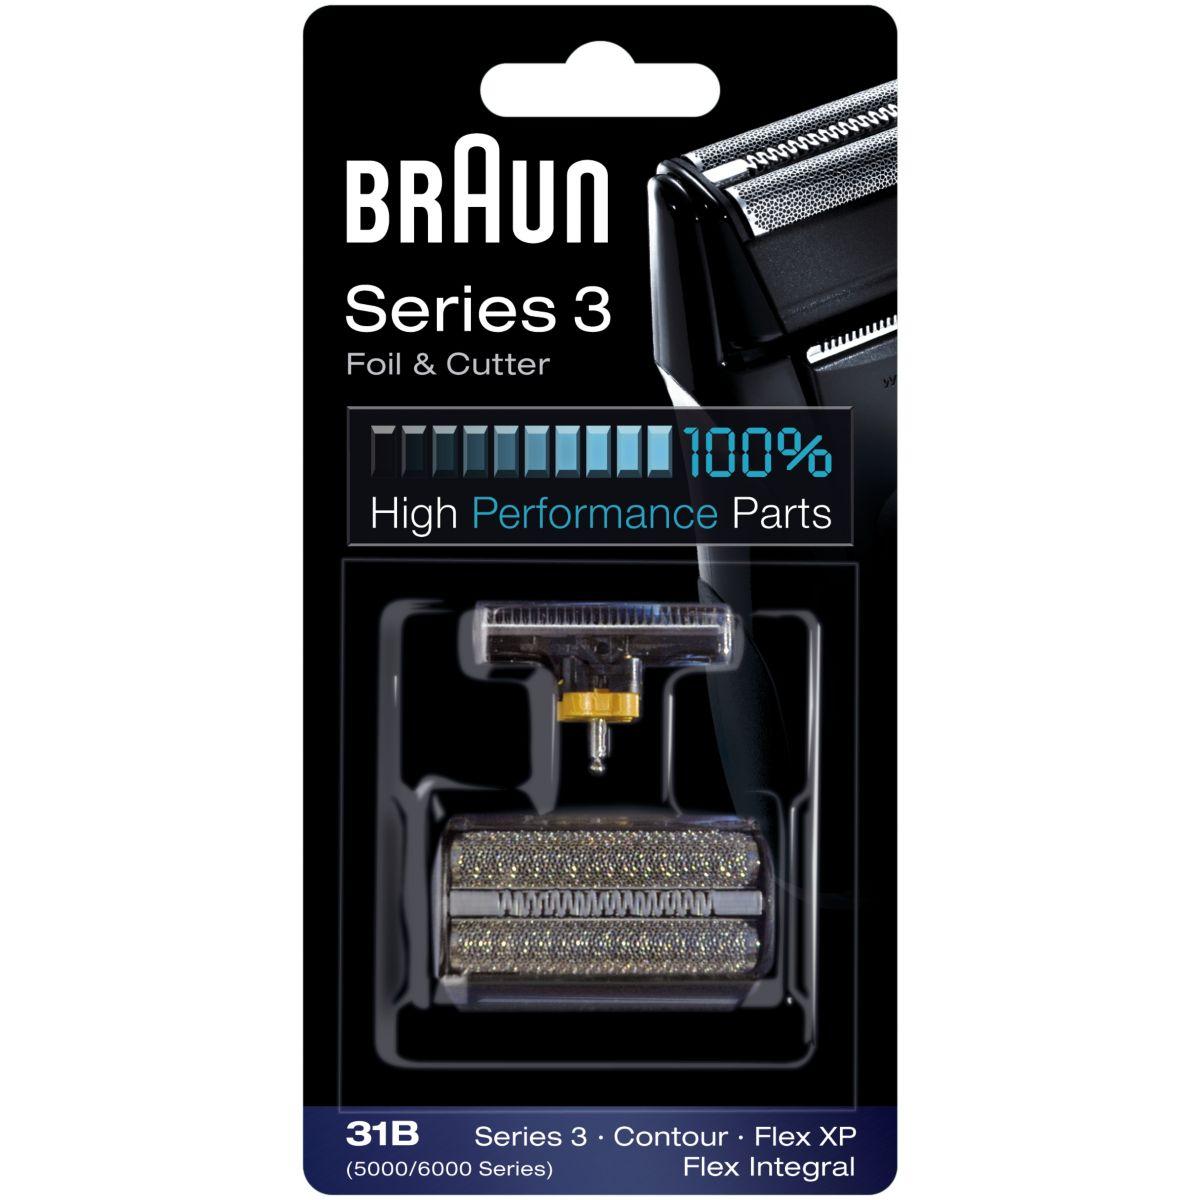 Pack BRAUN 31B serie 3